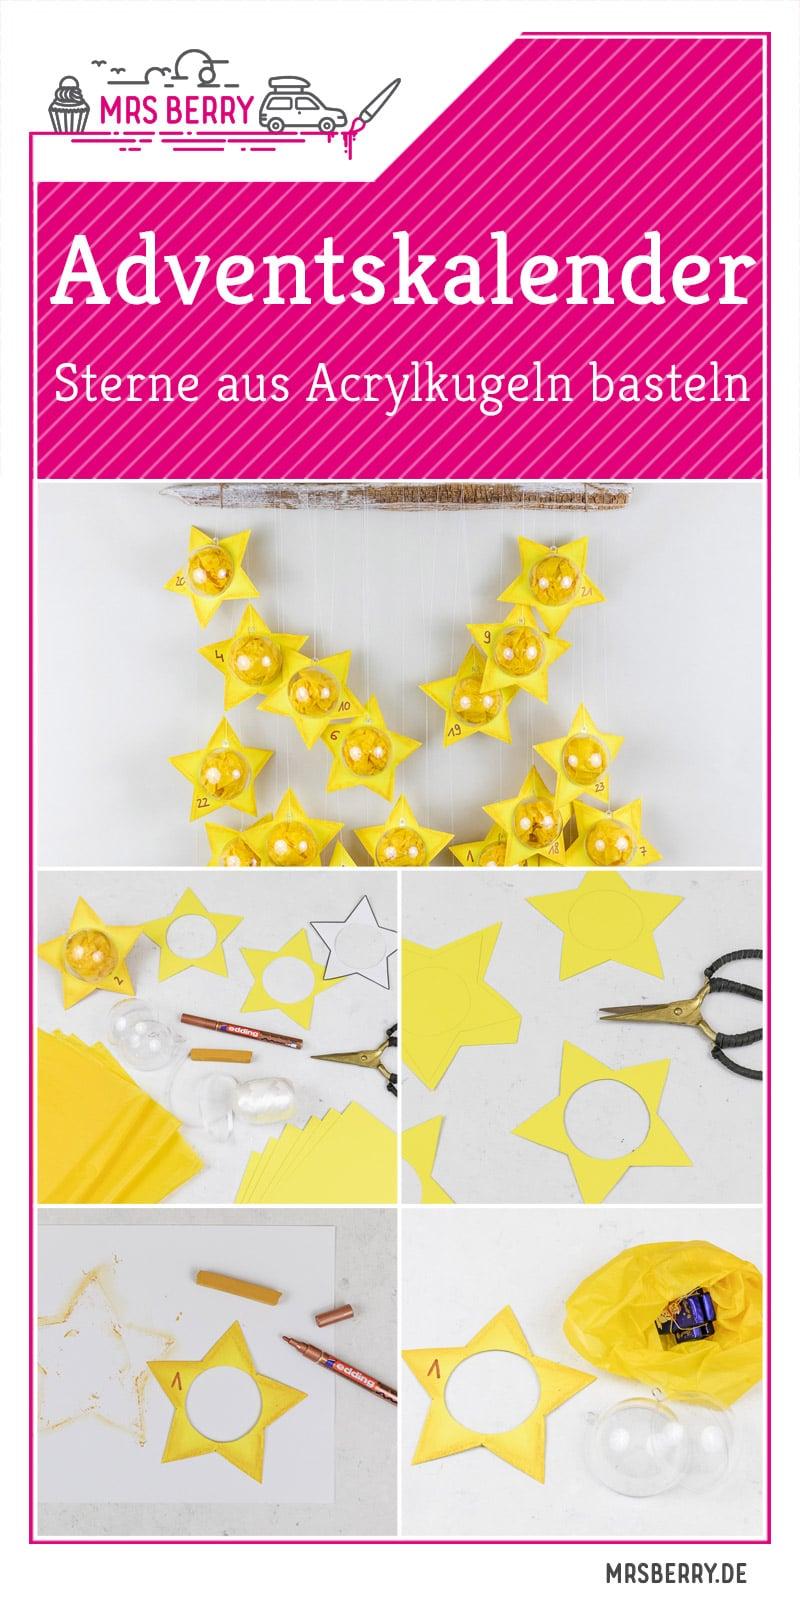 DIY Adventskalender Sterne aus Acrylkugeln basteln   MrsBerry.de